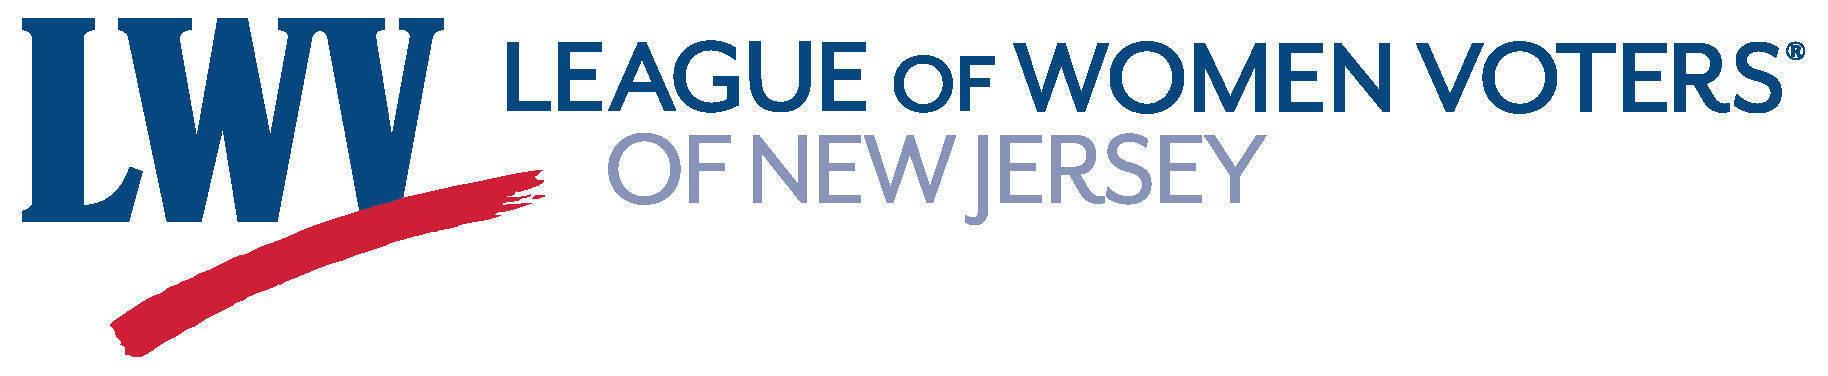 League of Women Voters Logo.png